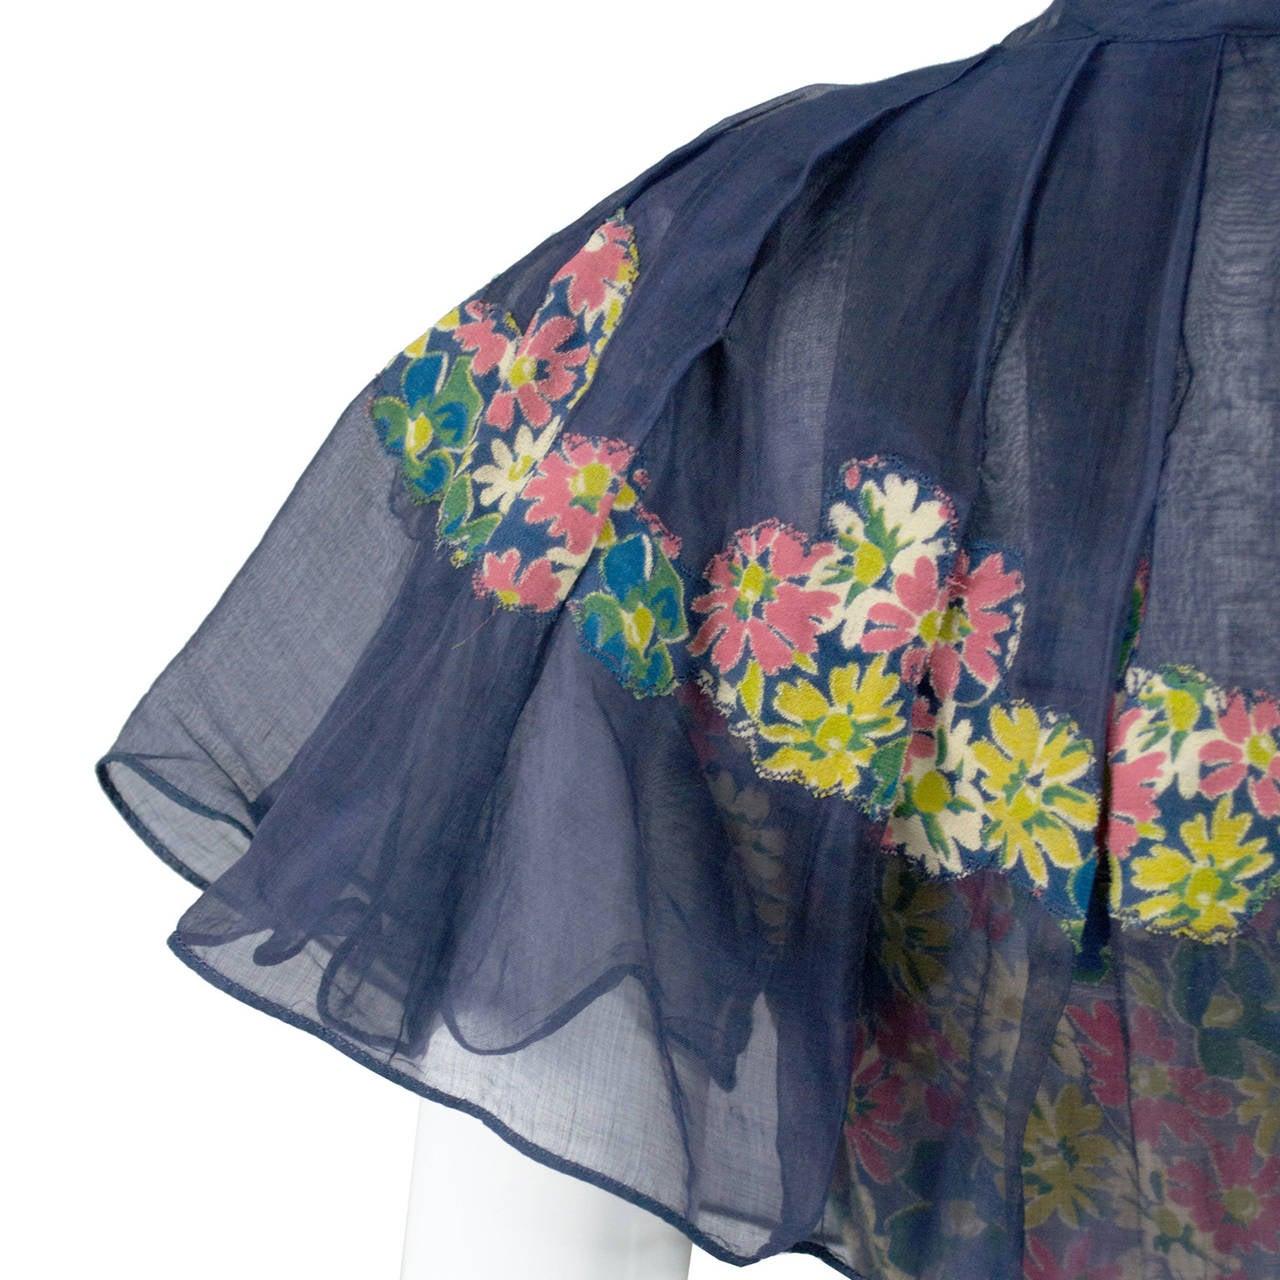 Rare 1930s Vintage Chanel Adaptation Dress Floral Velvet Applique Silk Organza 5